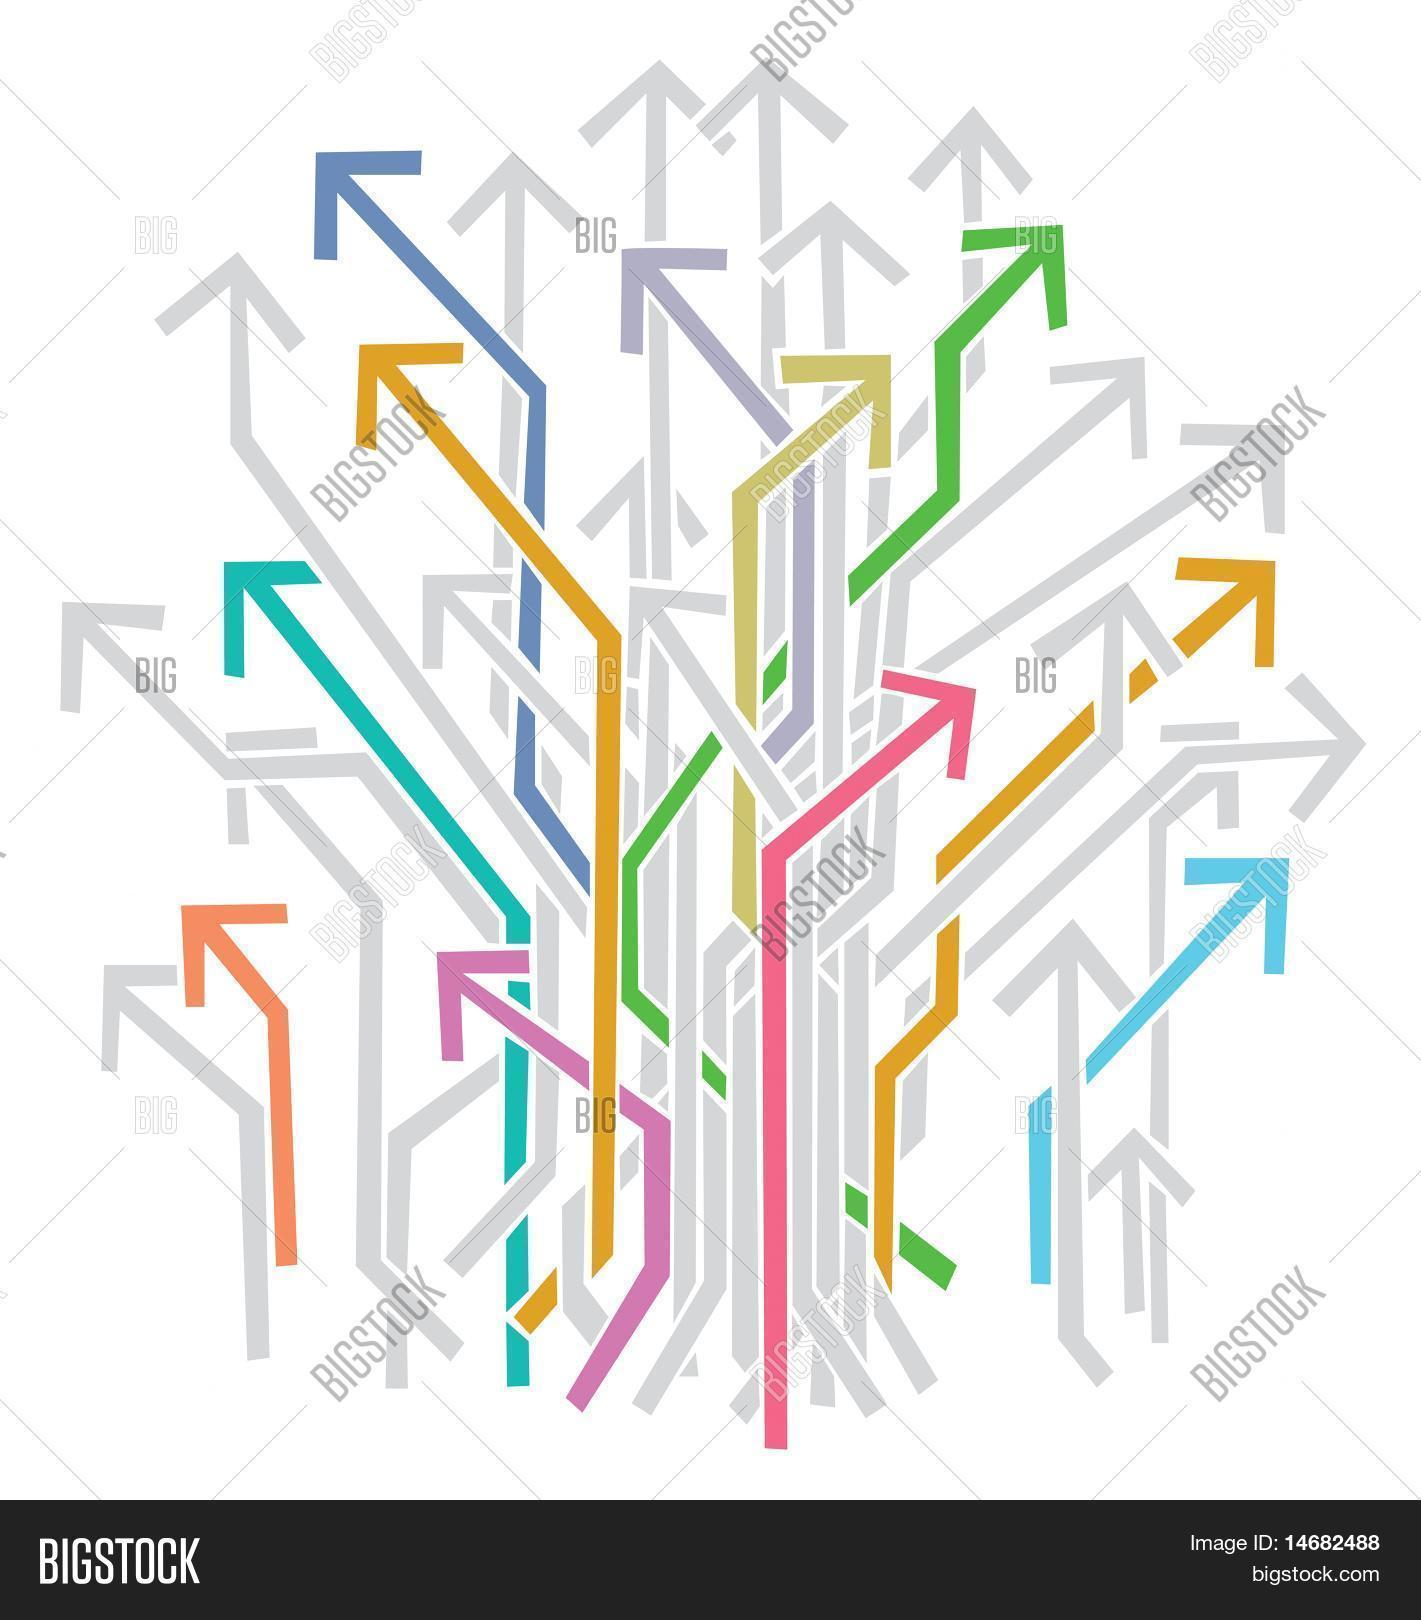 Bunch Colorful Arrows Vector & Photo (Free Trial) | Bigstock